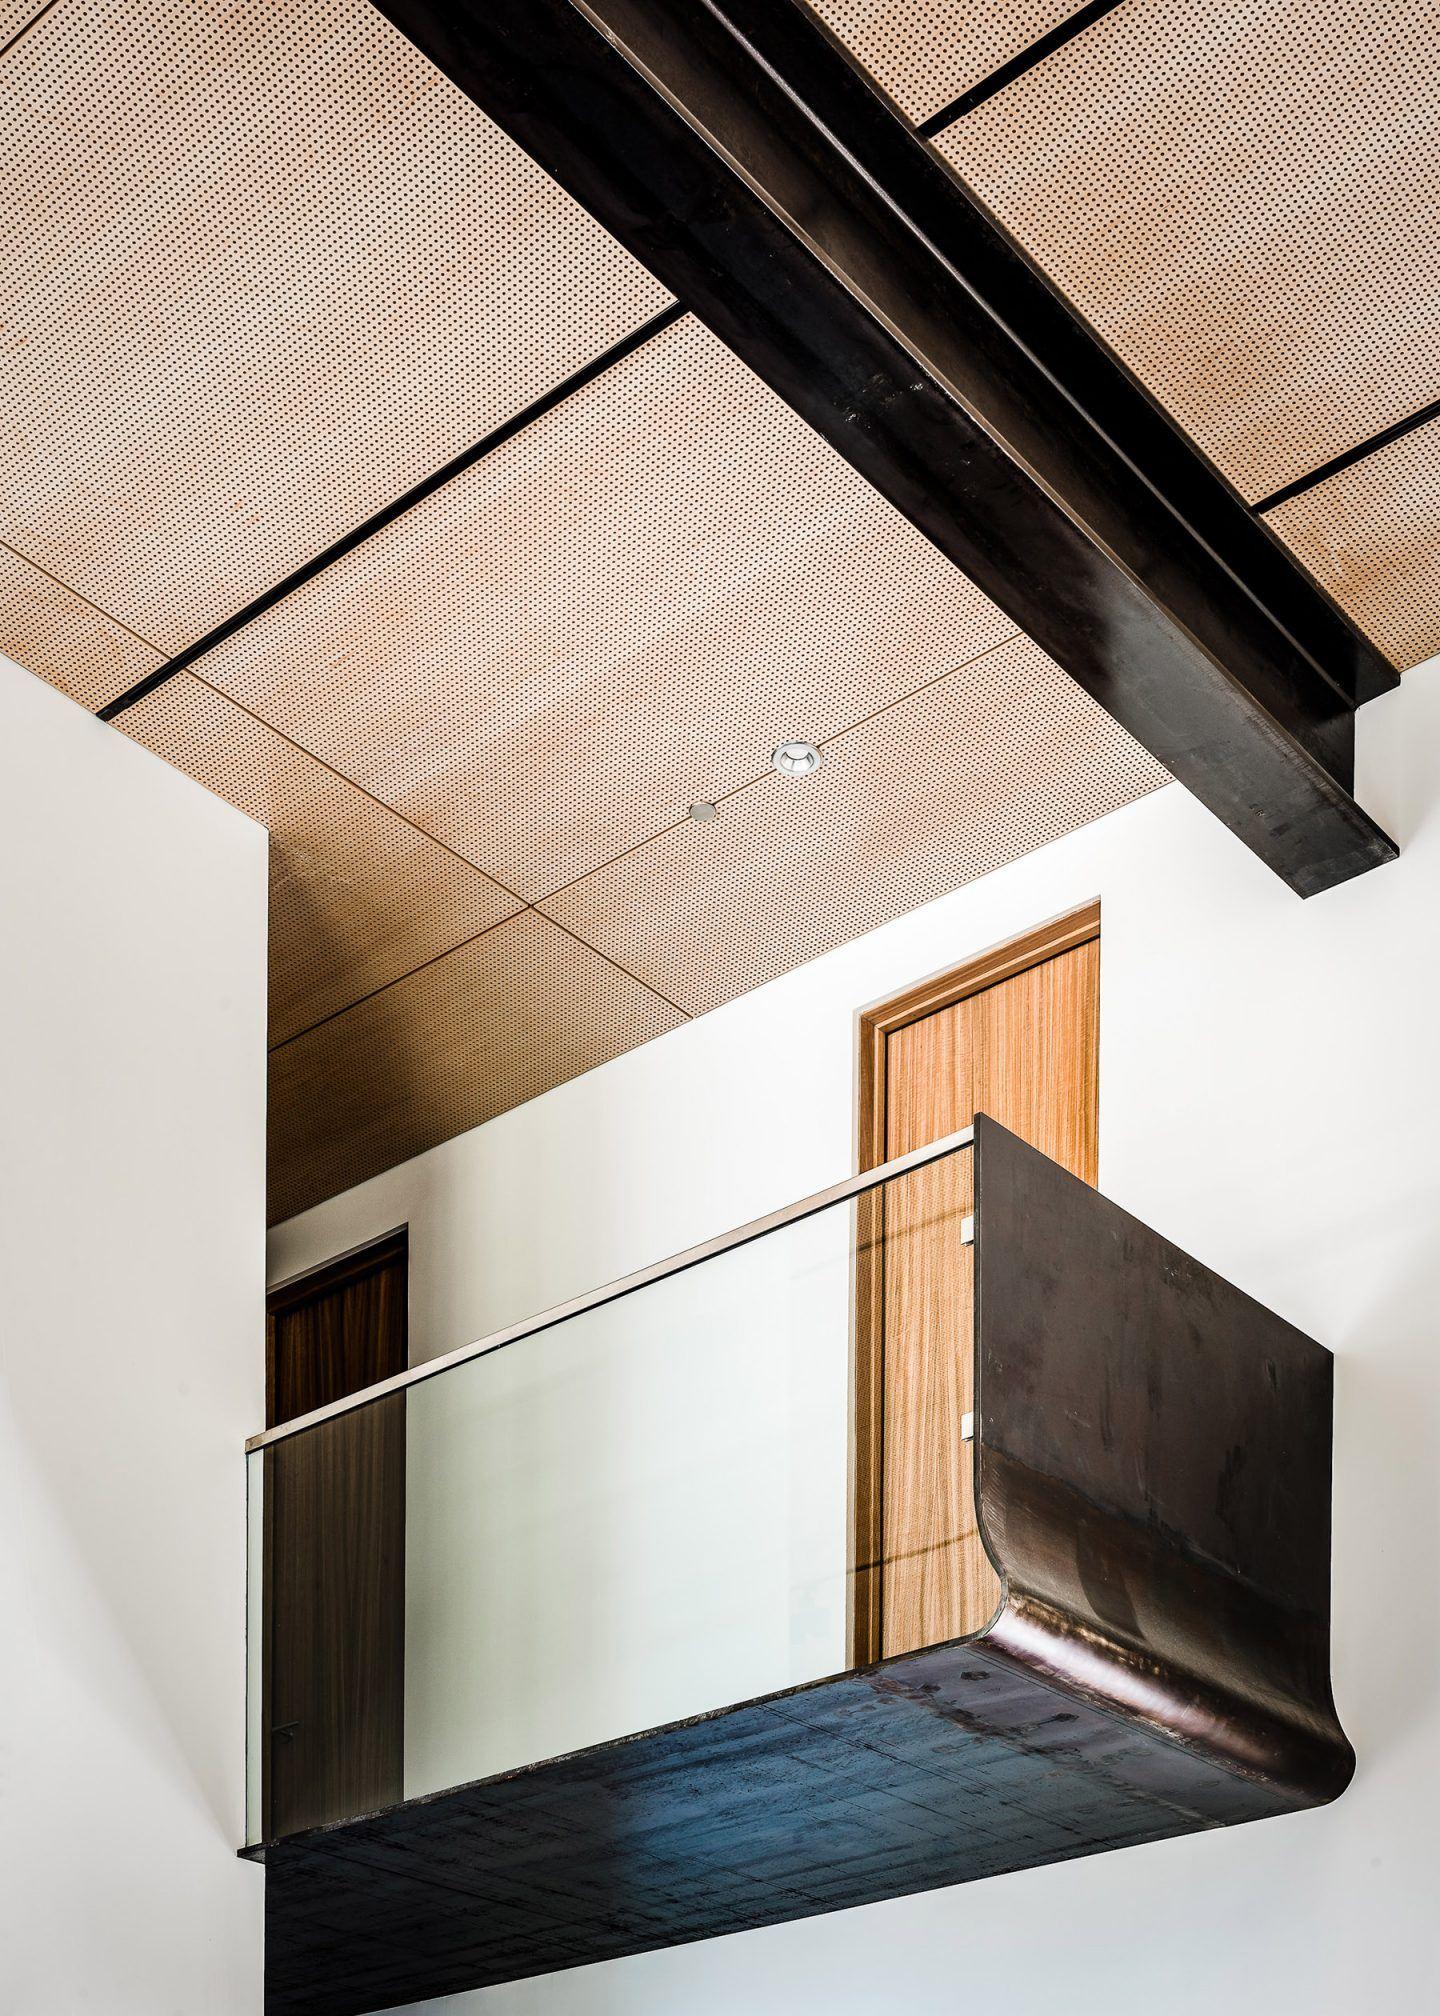 IGNANT-Architecture-Faulkner-Architects-Burnt-Cedar-014